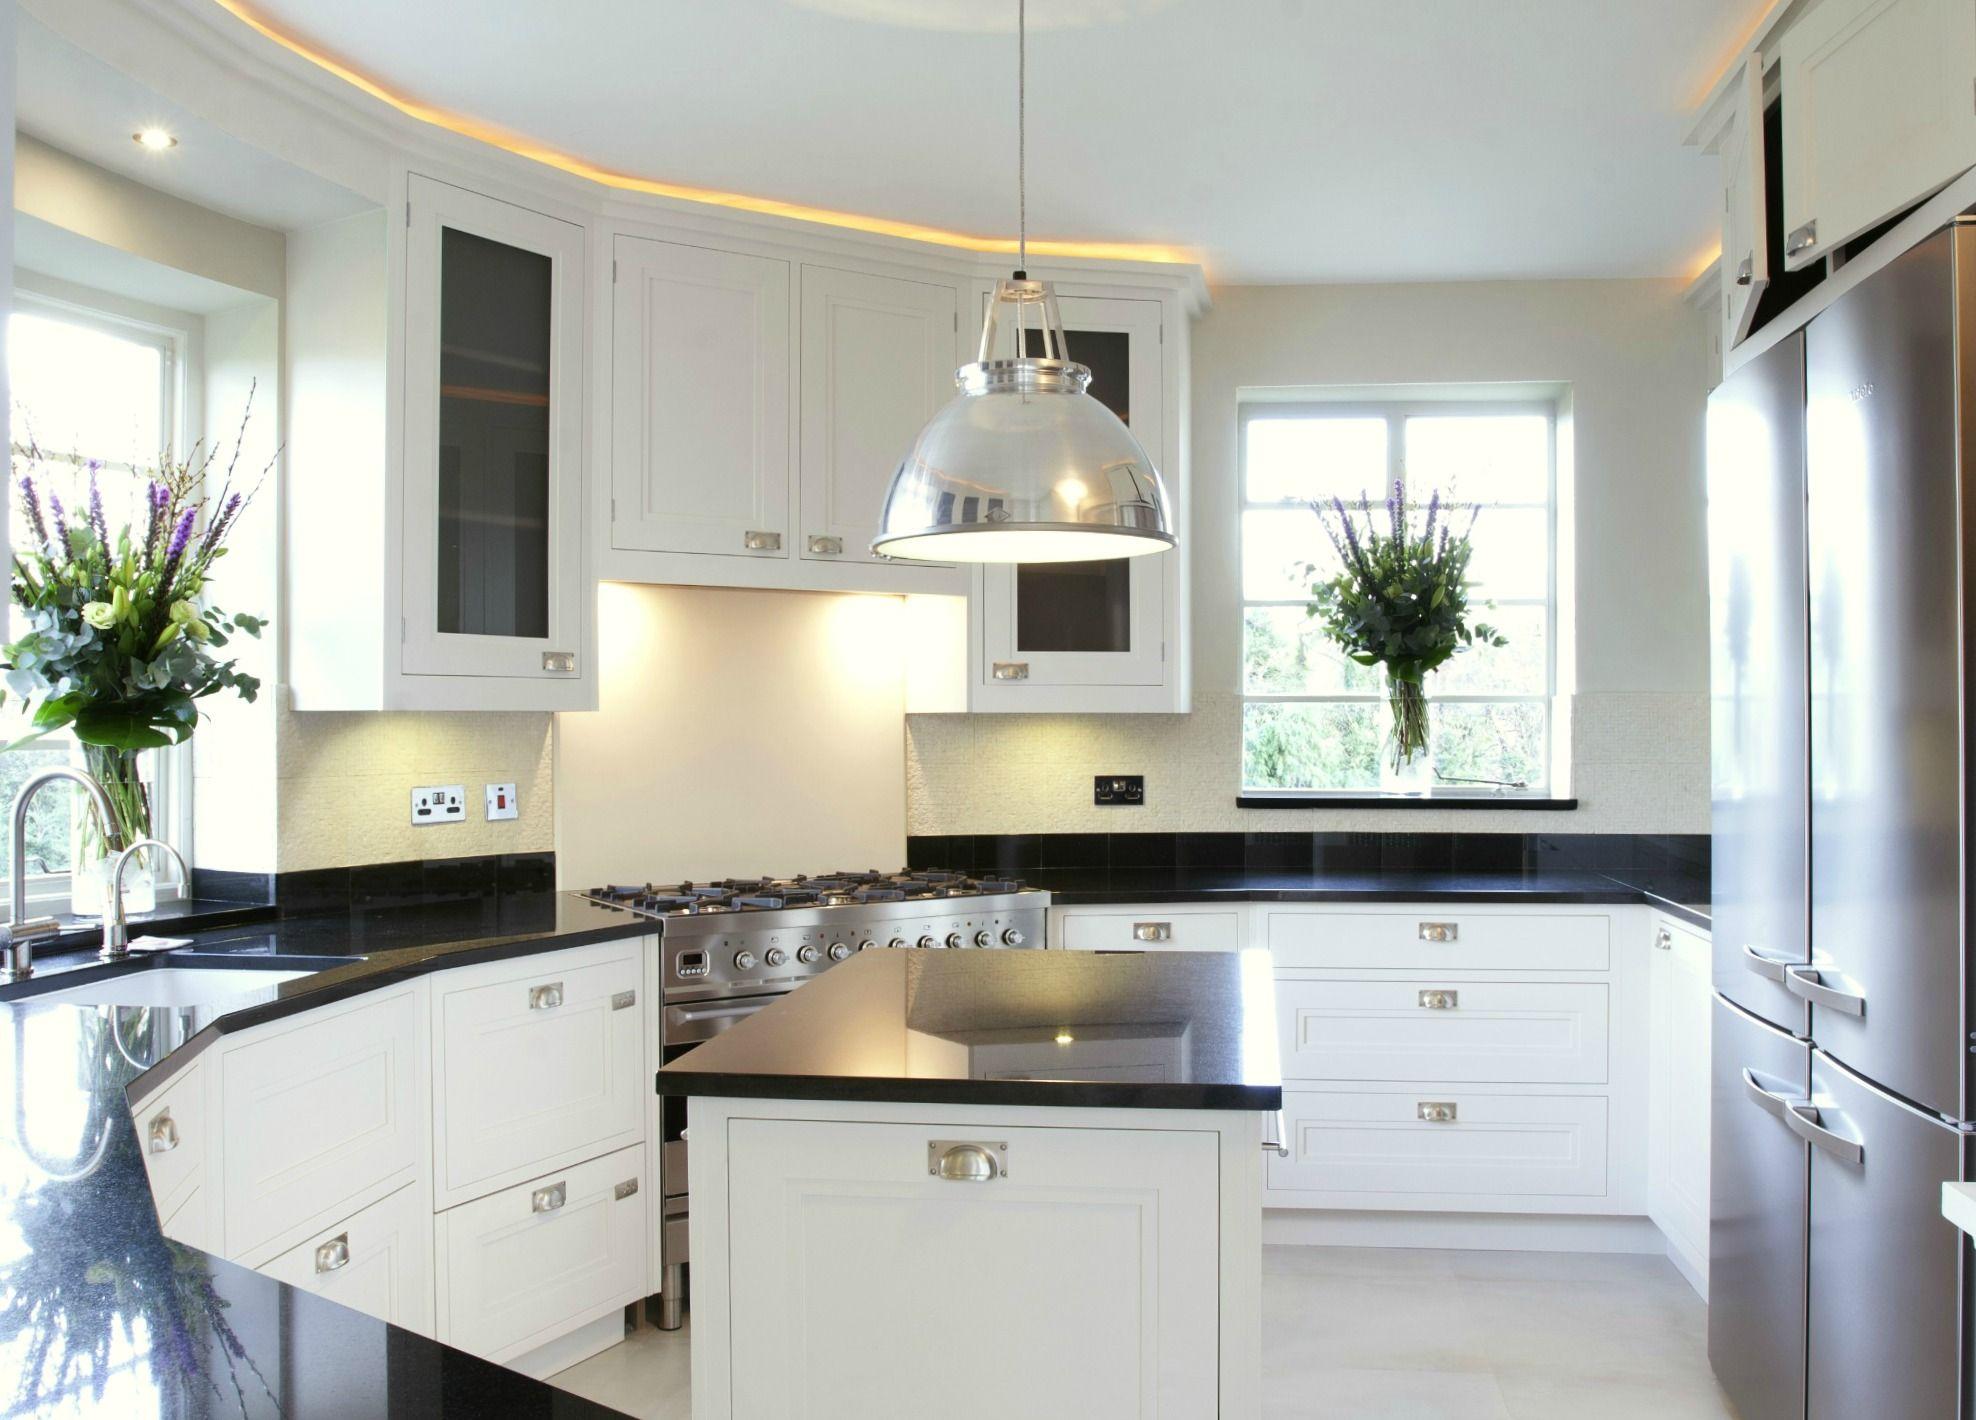 Art Deco Kitchen Putney From Open Plan Designs Art Deco Kitchen Cabinet Art Deco Kitchen Kitchen Cabinet Styles